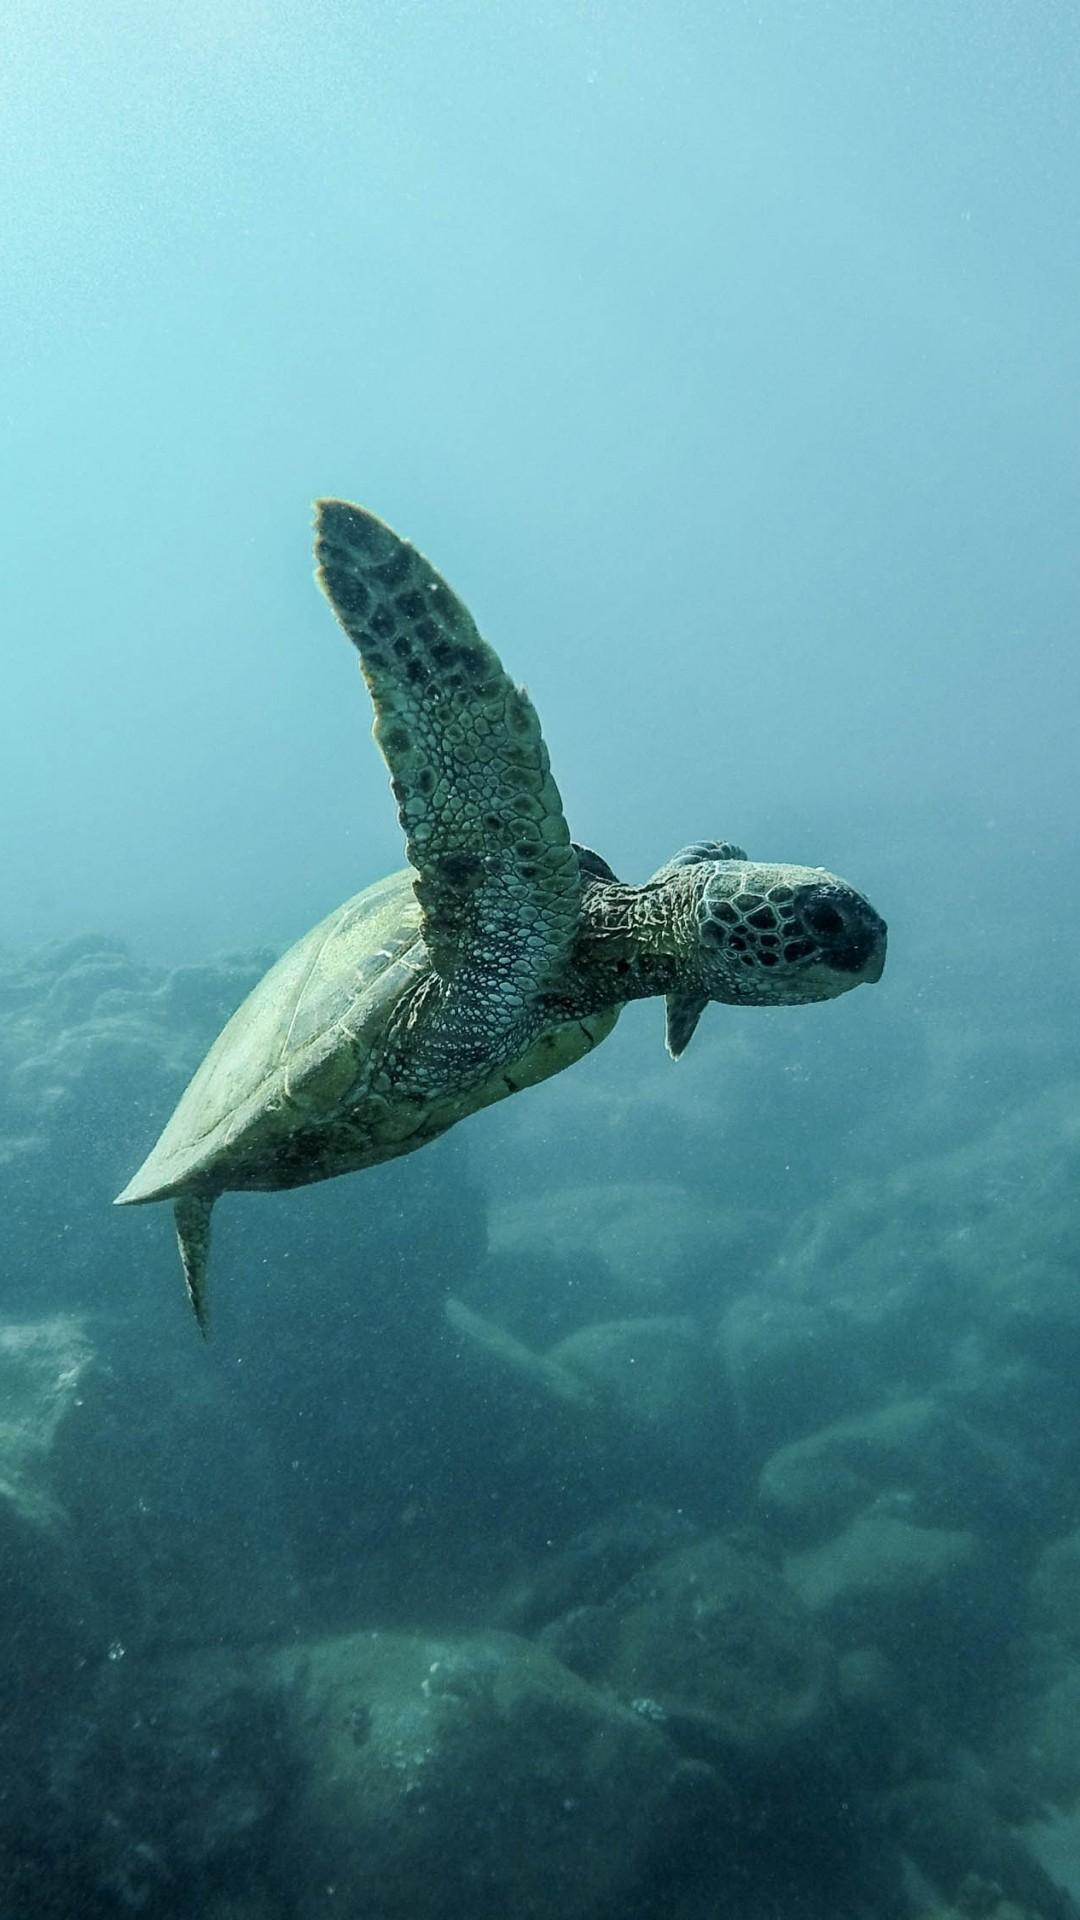 Turtle iPhone 7 wallpaper